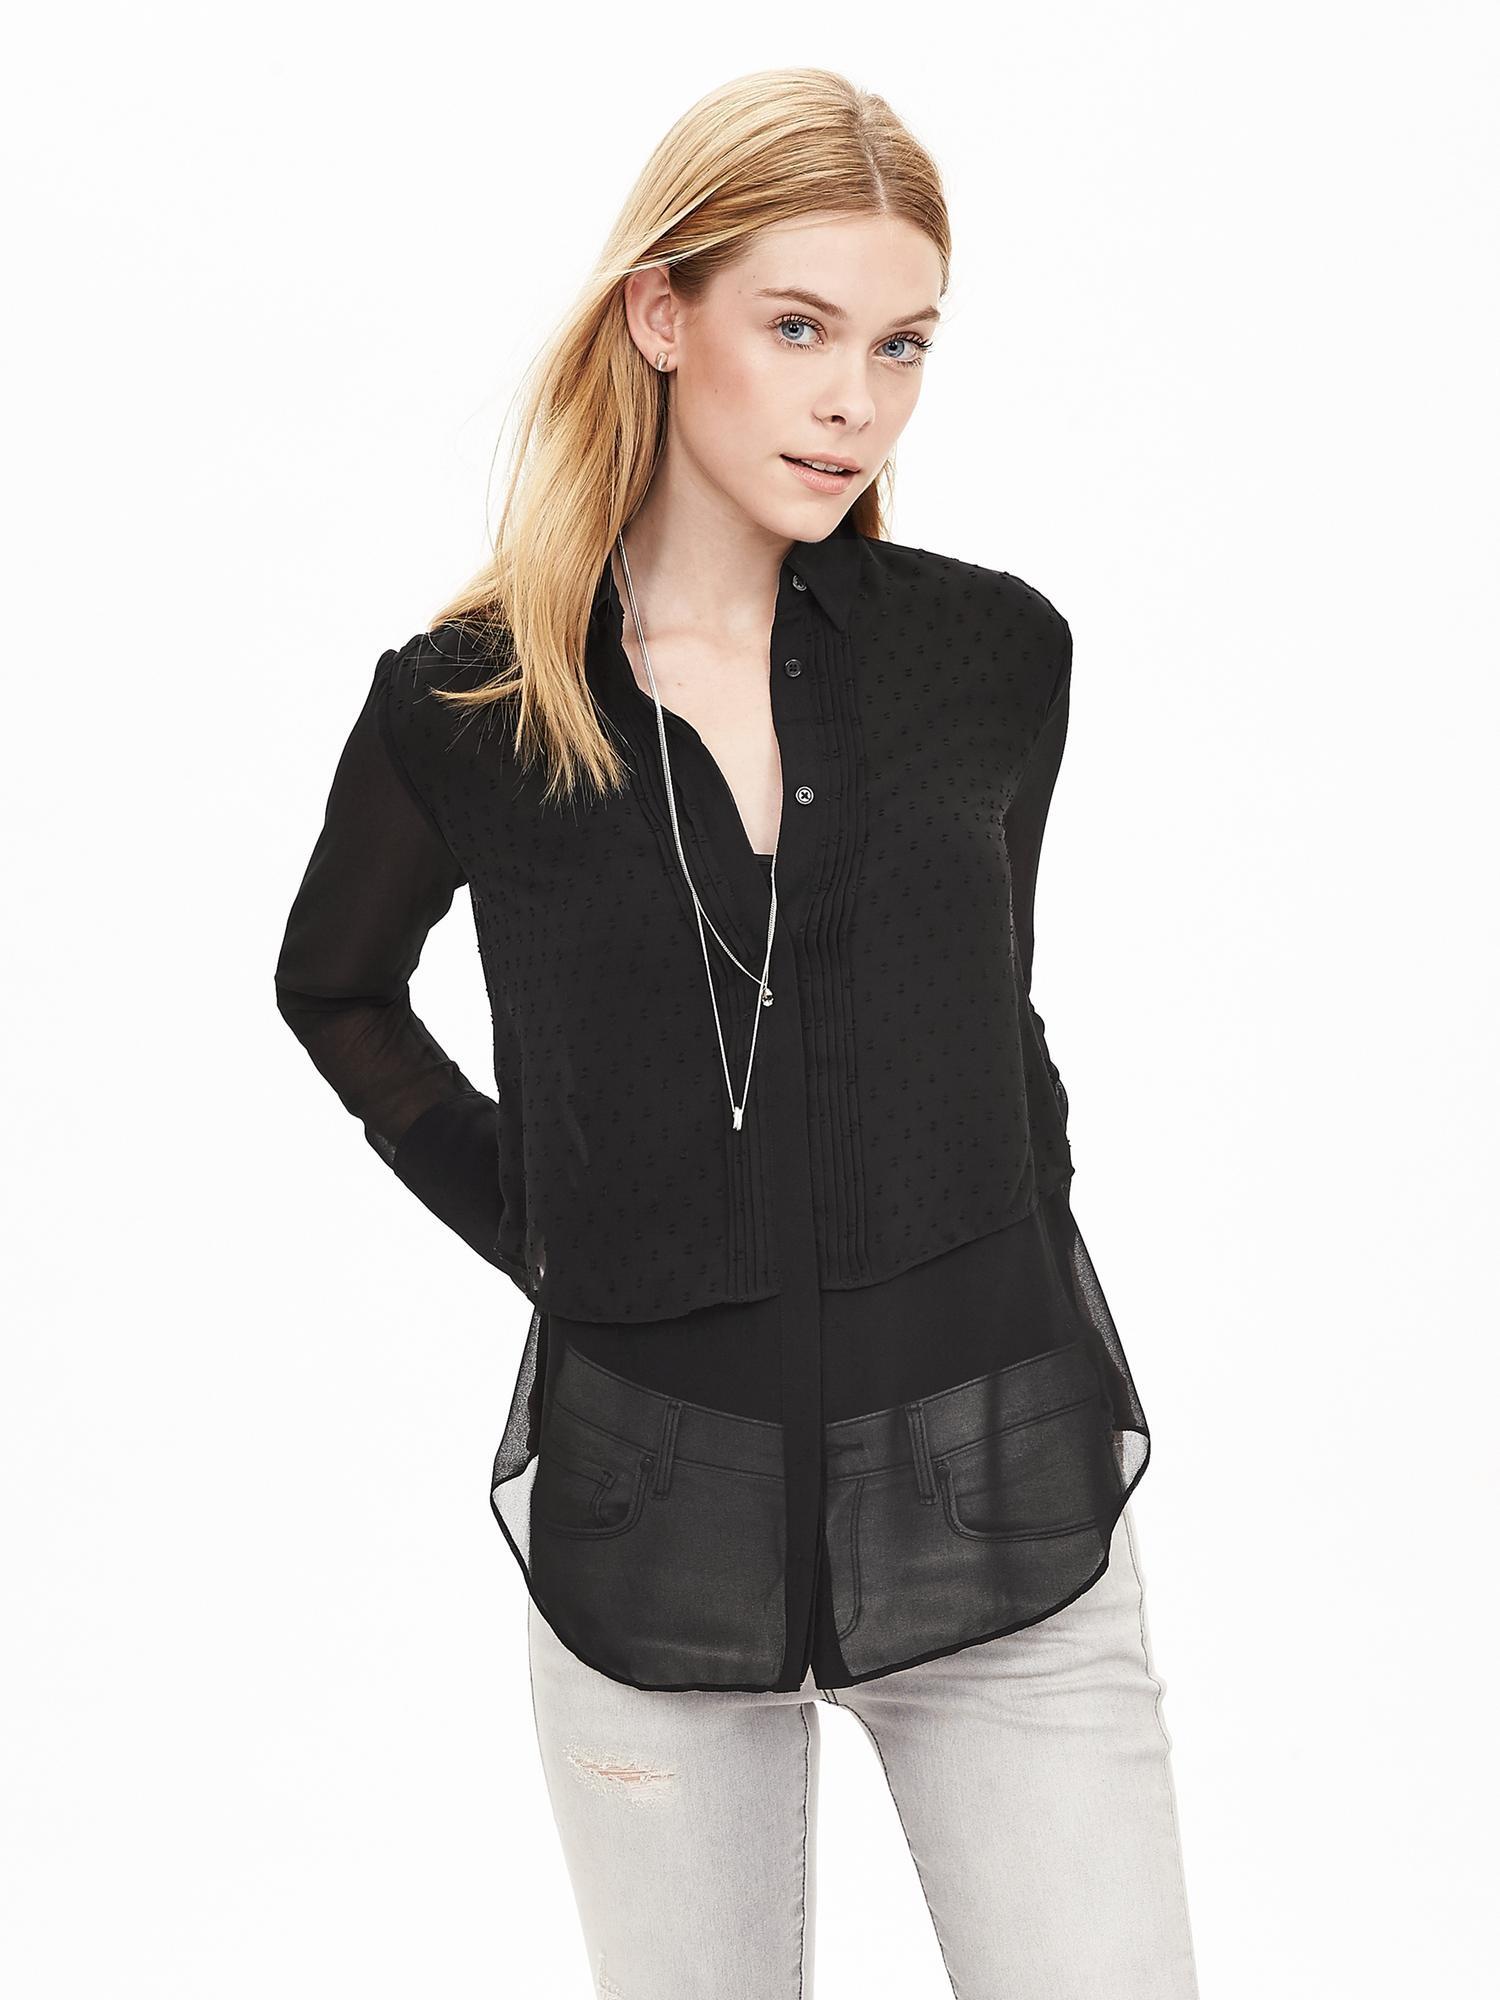 Блузки дизайнерские